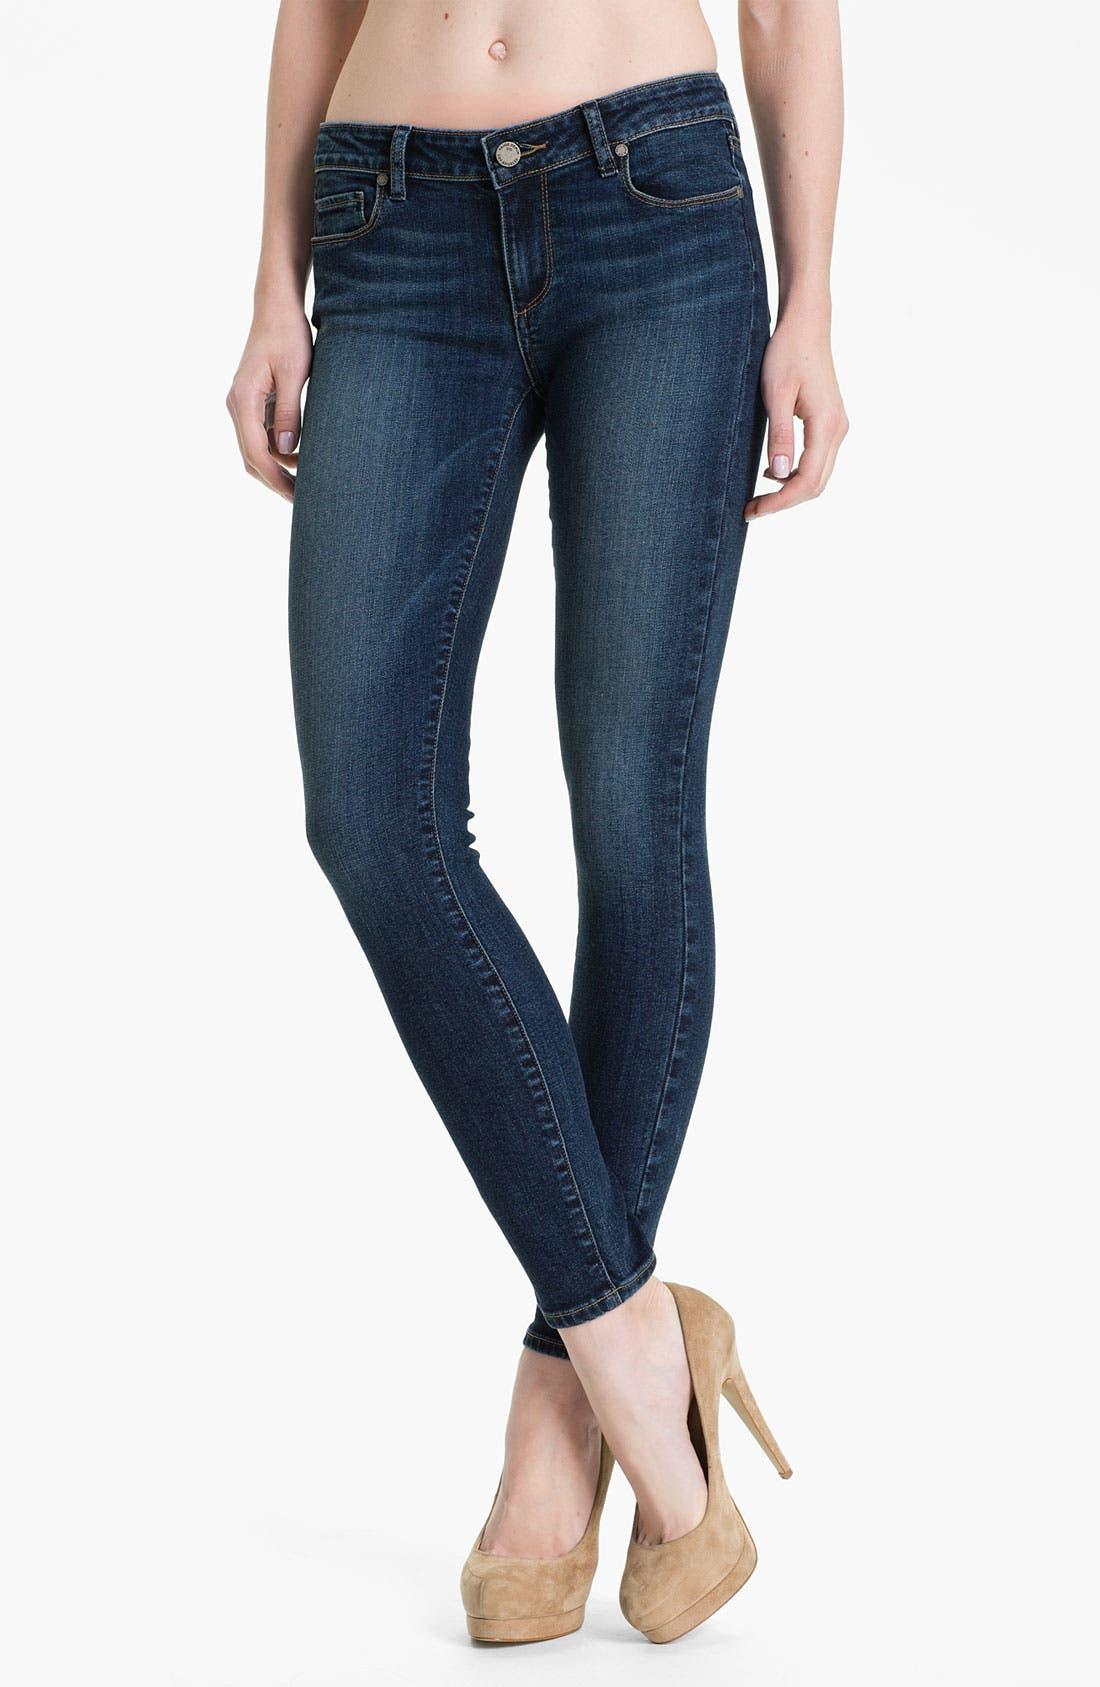 Main Image - Paige Denim 'Verdugo' Stretch Denim Skinny Jeans (Benny)